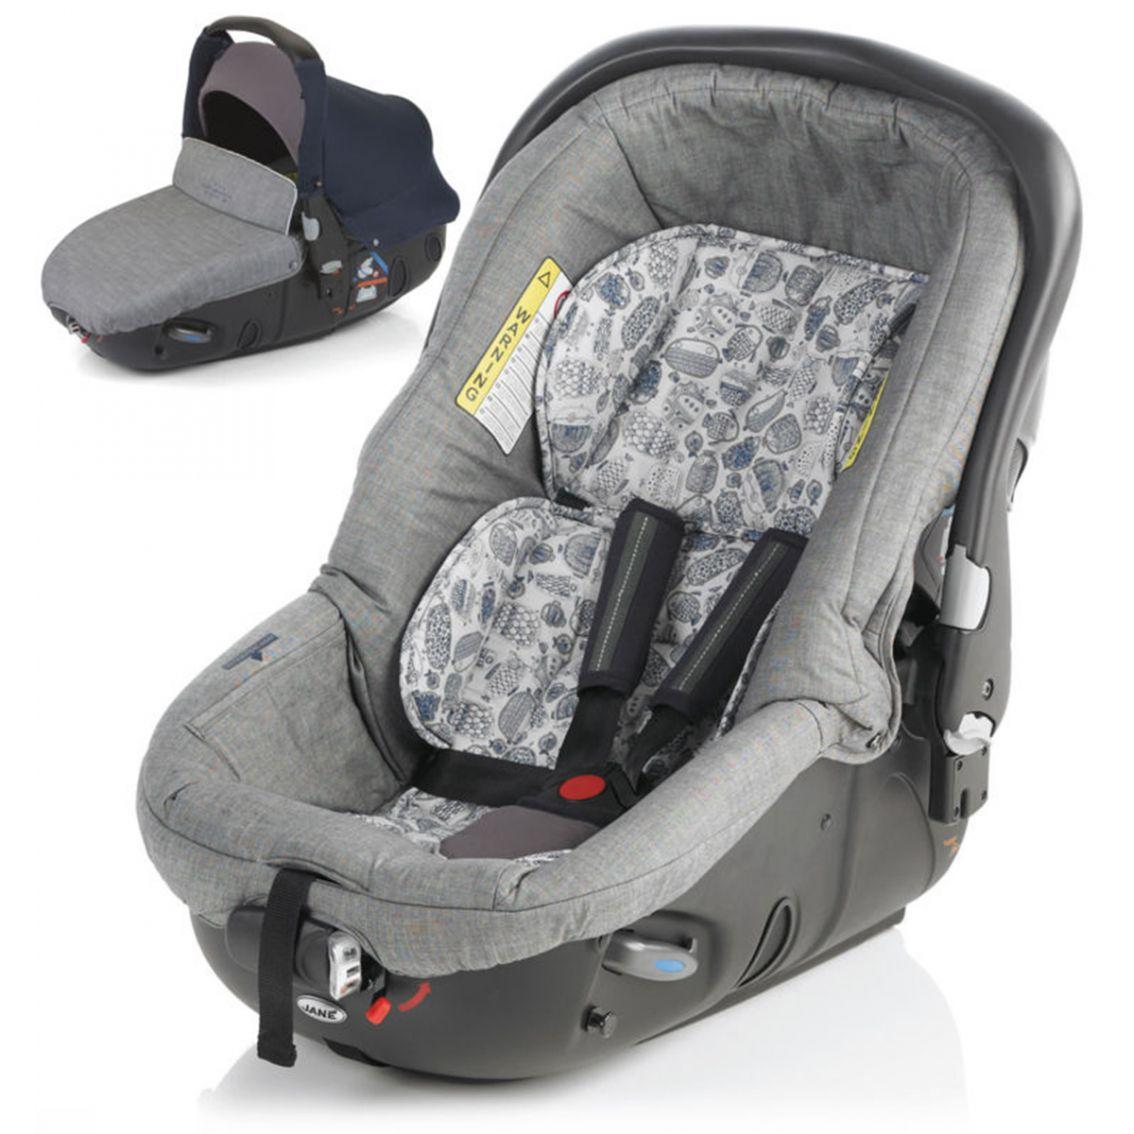 jan jane matrix light 2 car seat blue moon jan from w h watts son ltd uk. Black Bedroom Furniture Sets. Home Design Ideas